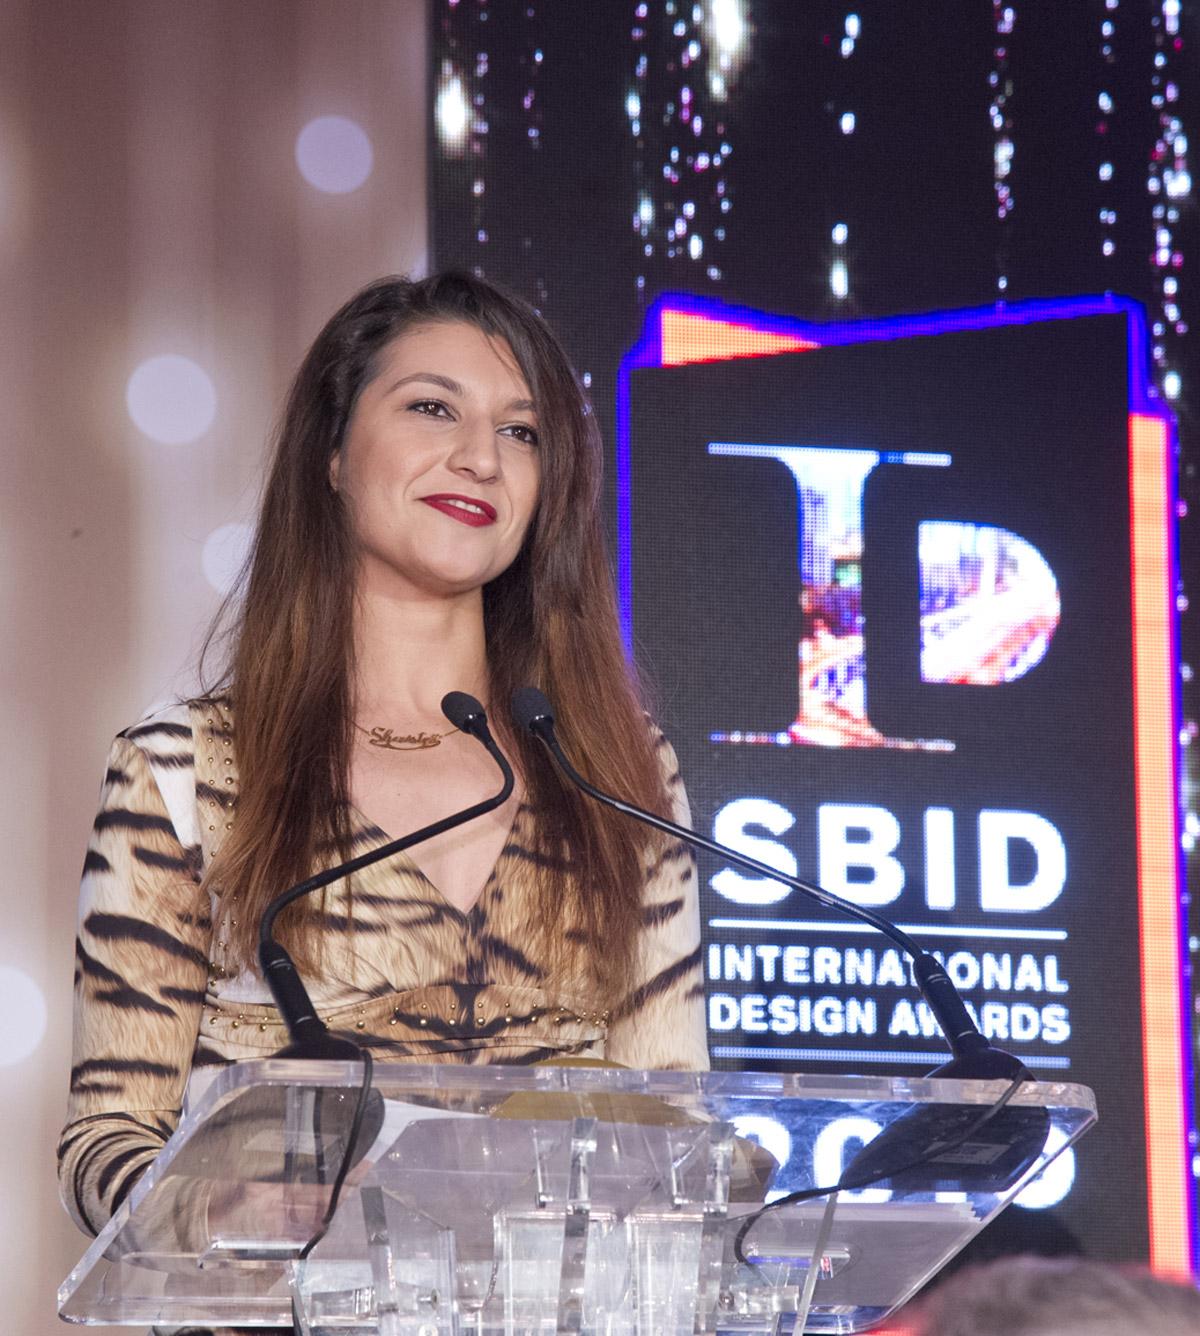 SBID Awards 2019